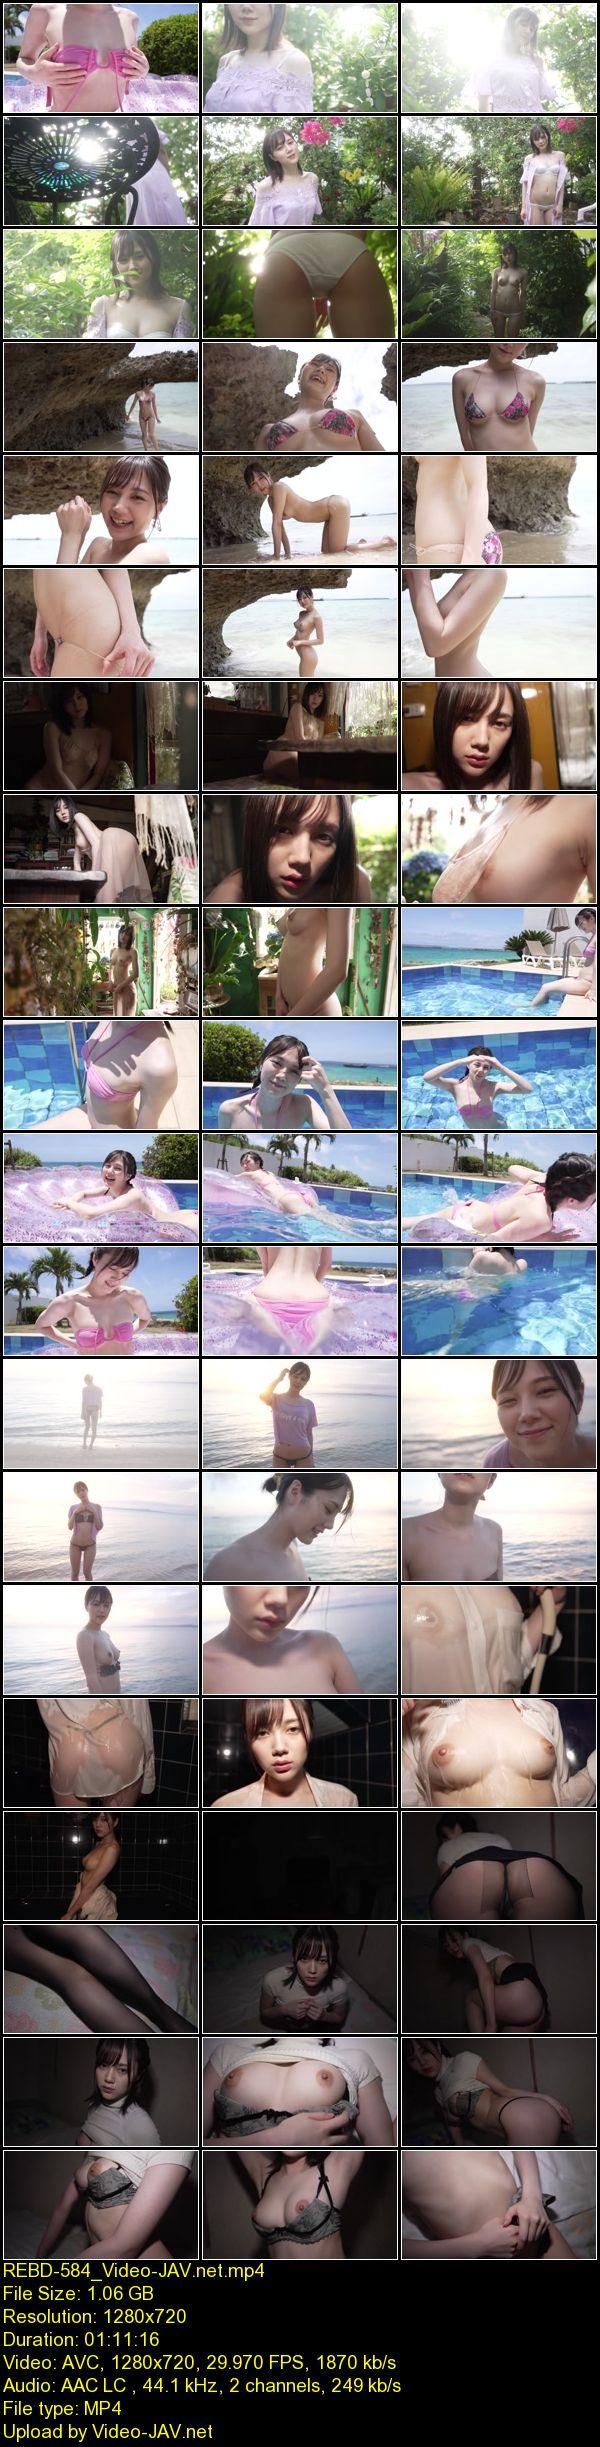 JAV Download Remu Suzumori [REBD 584] Remu4 Last paradise・涼森れむ 2021 09 02